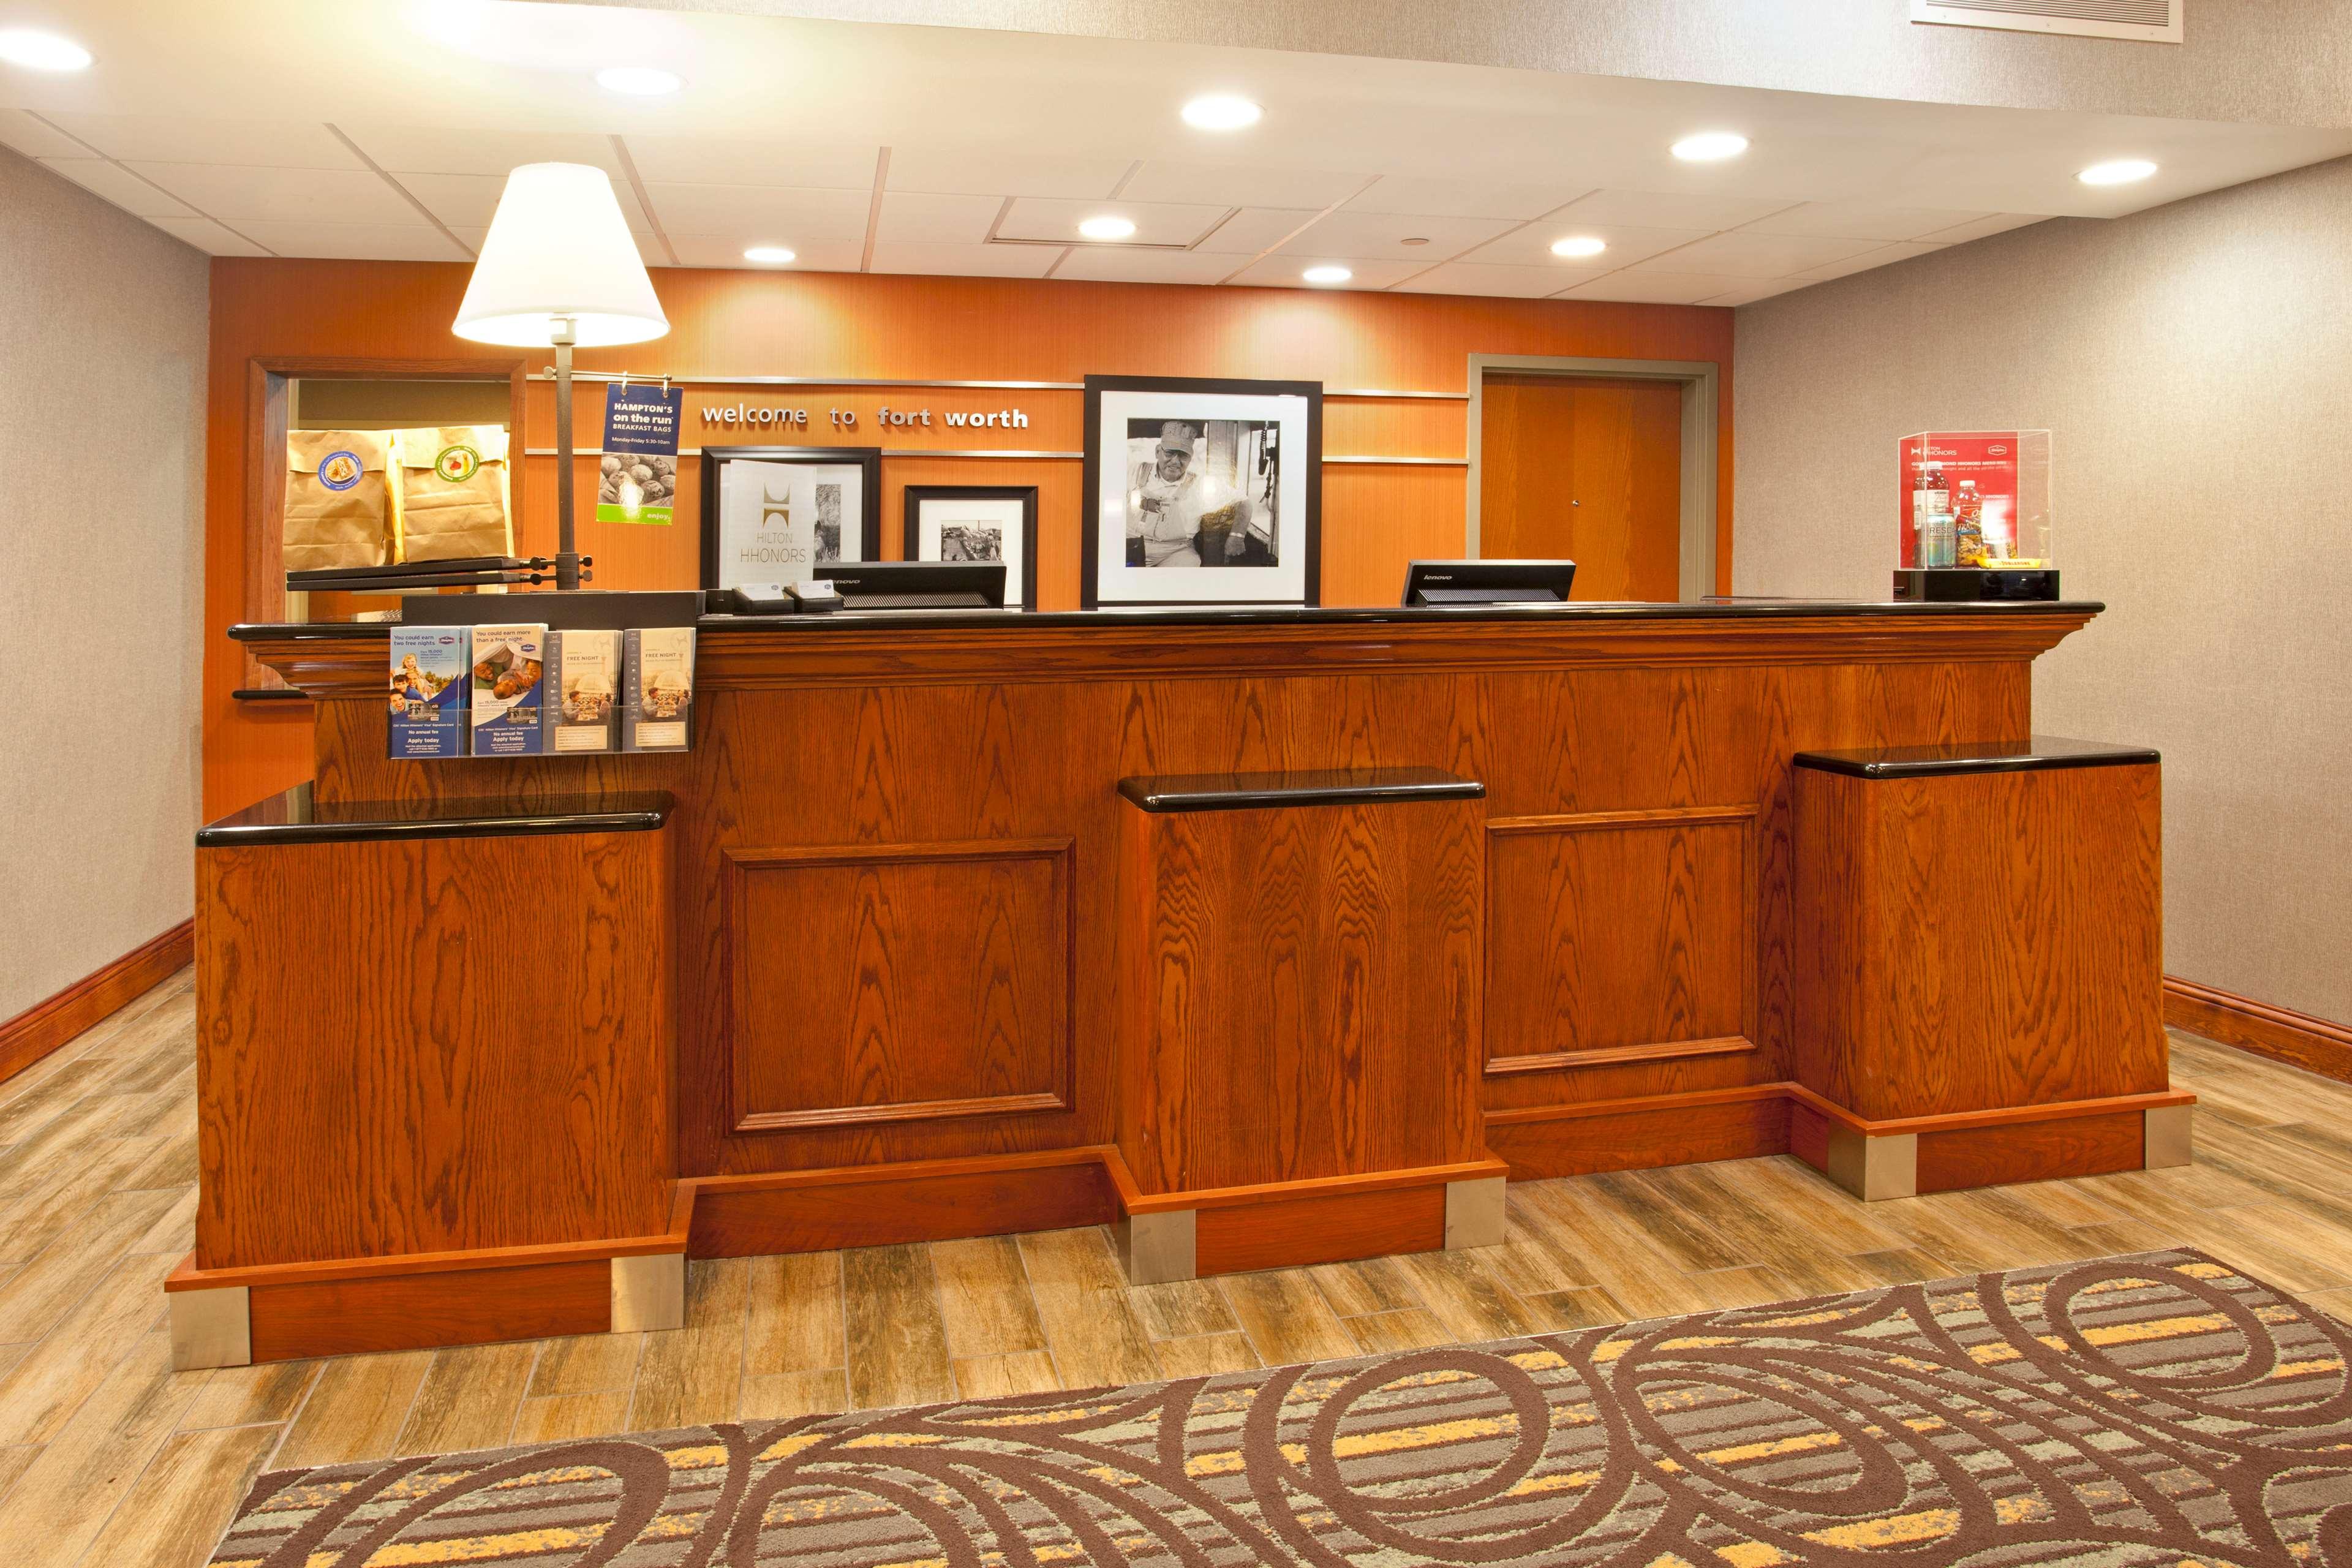 Hampton Inn & Suites Fort Worth-West-I-30 image 2